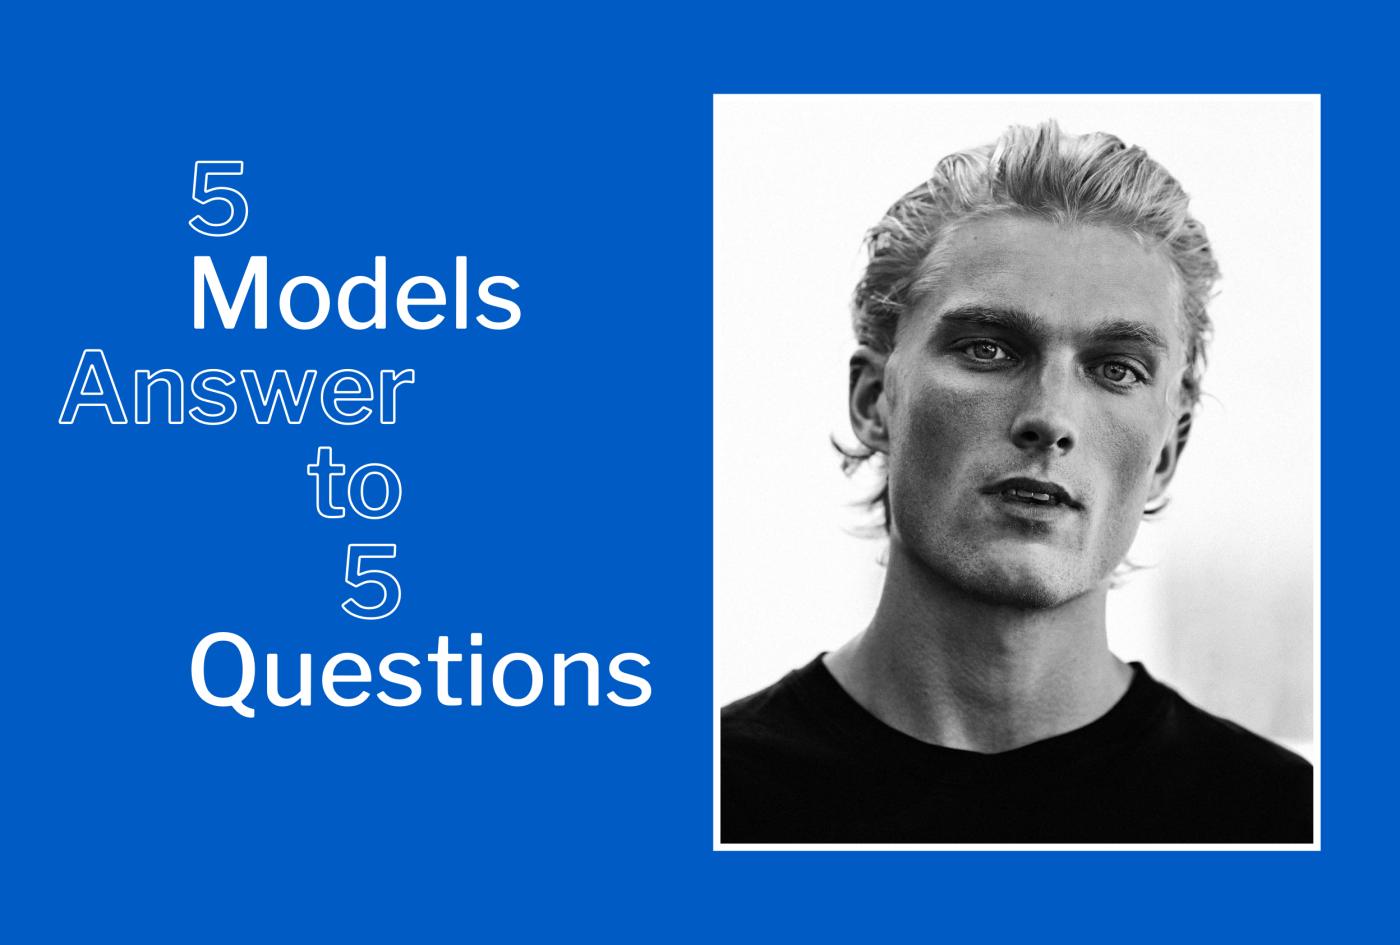 Modelling Advice - Nicklas Kingo